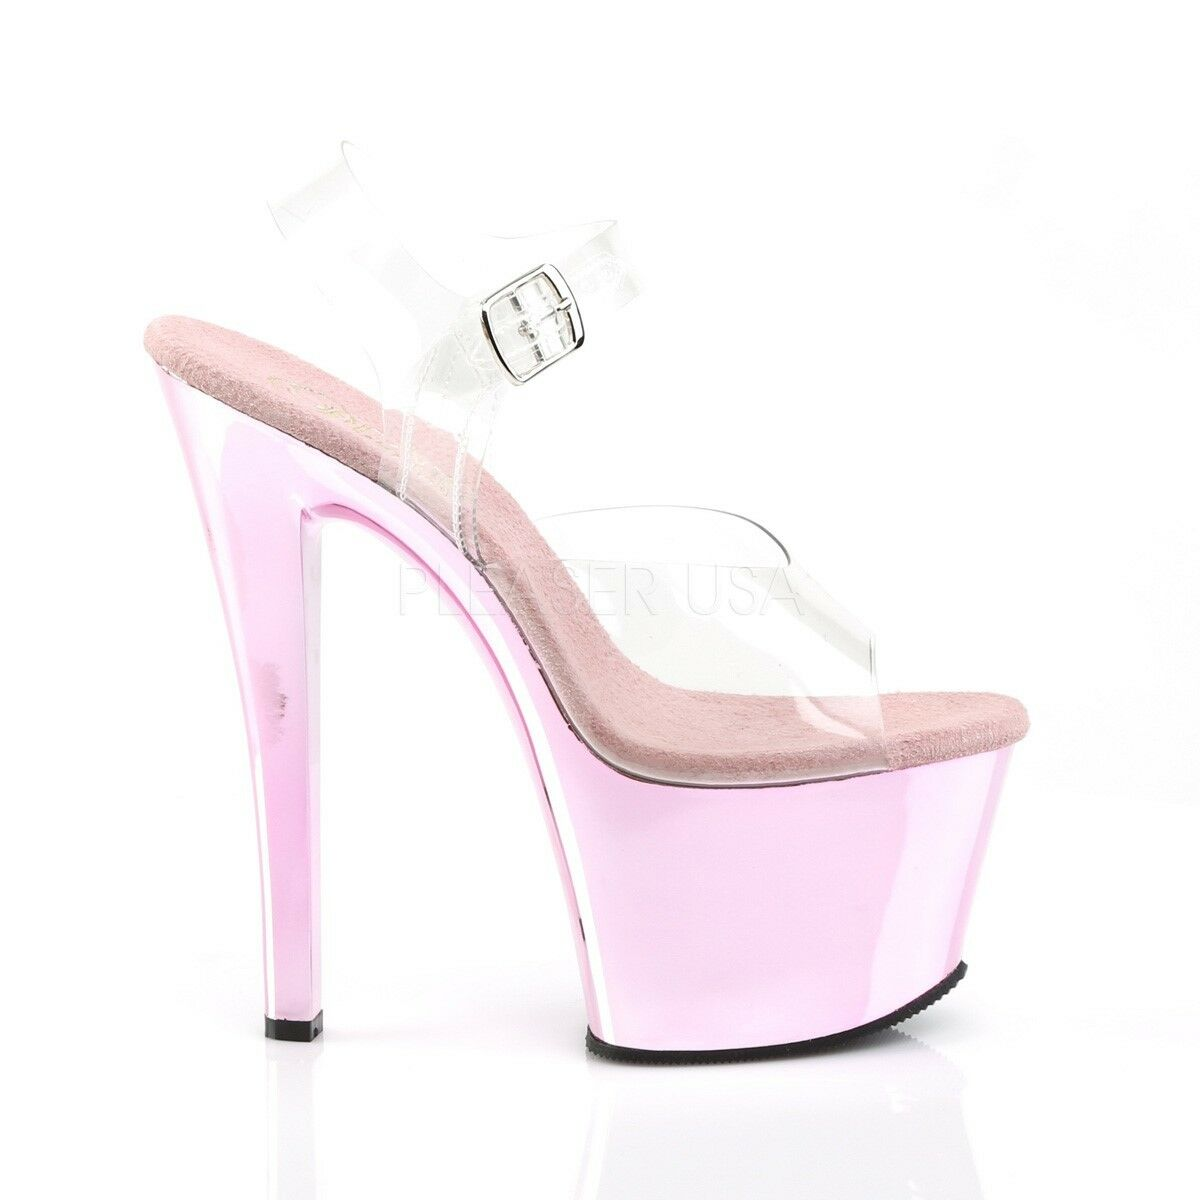 PLEASER PLEASER PLEASER Sky-308 Donna Rosa Spike Punta Aperta Pompa Slide vegan scarpa sandalo cinturino alla caviglia 2e8b8b